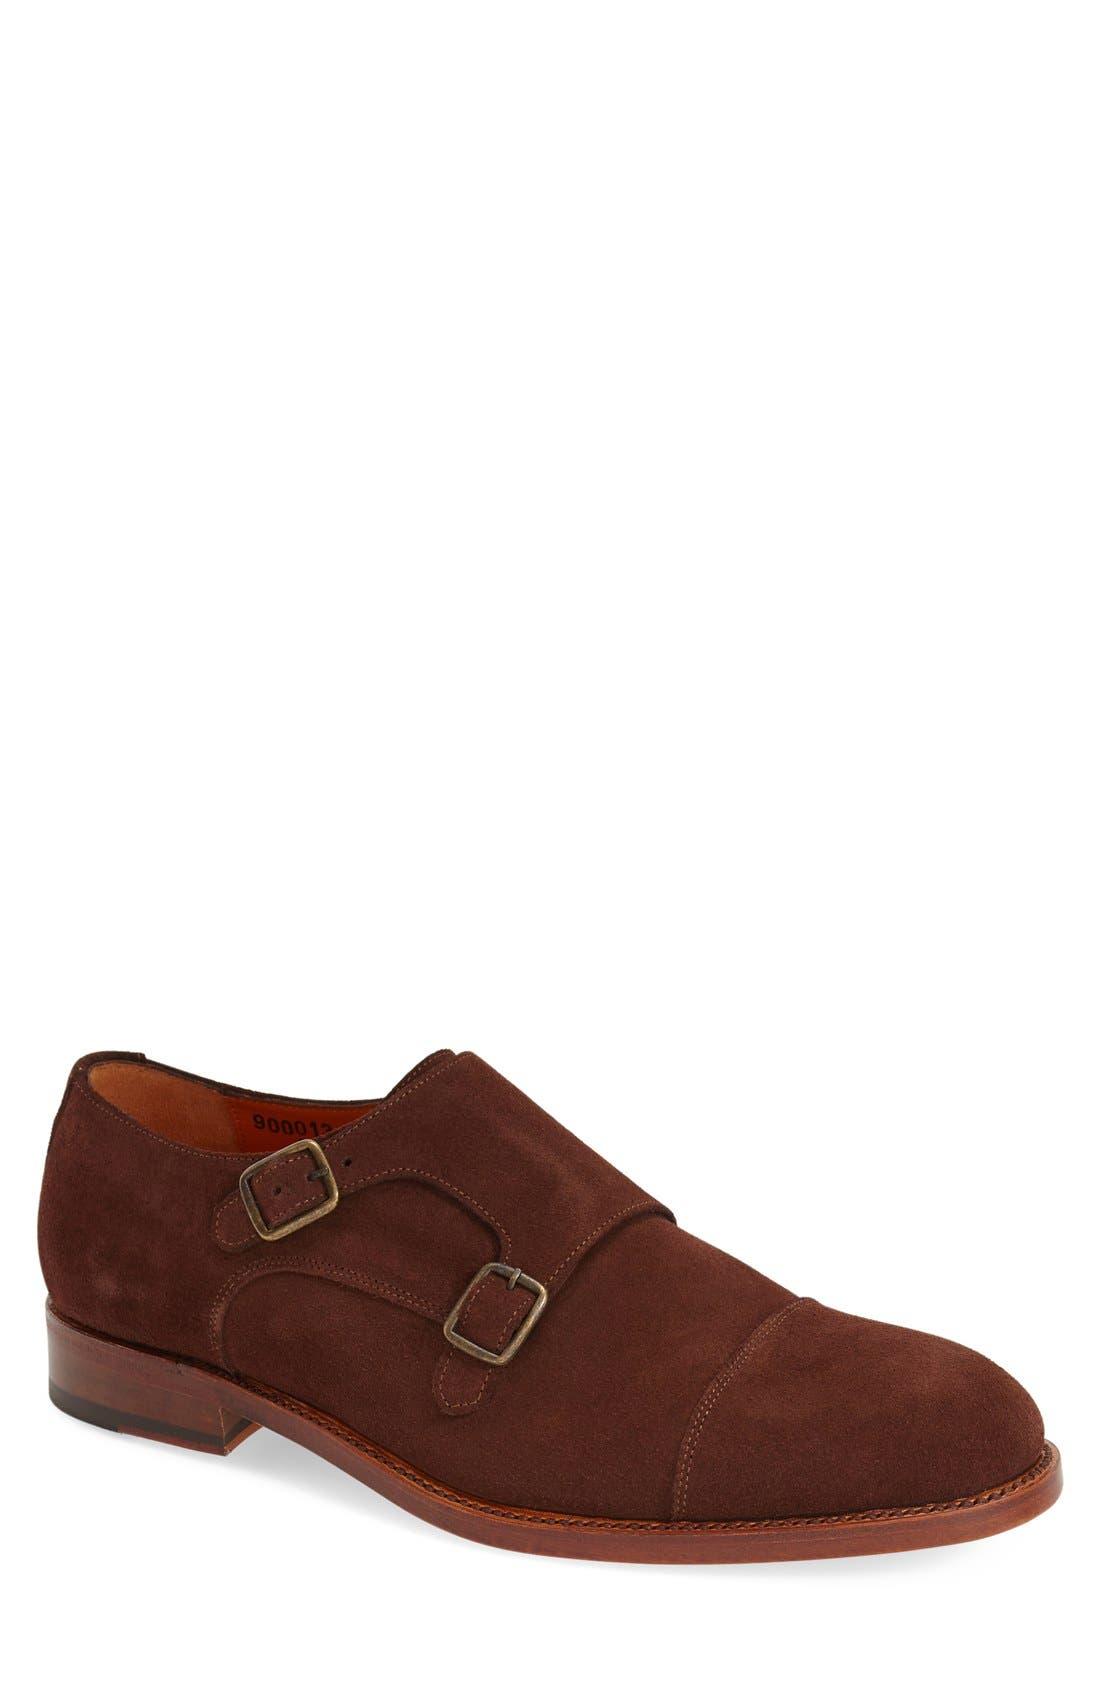 Alternate Image 1 Selected - Crosby Square 'Diplomat' Double Monk Strap Shoe (Men)